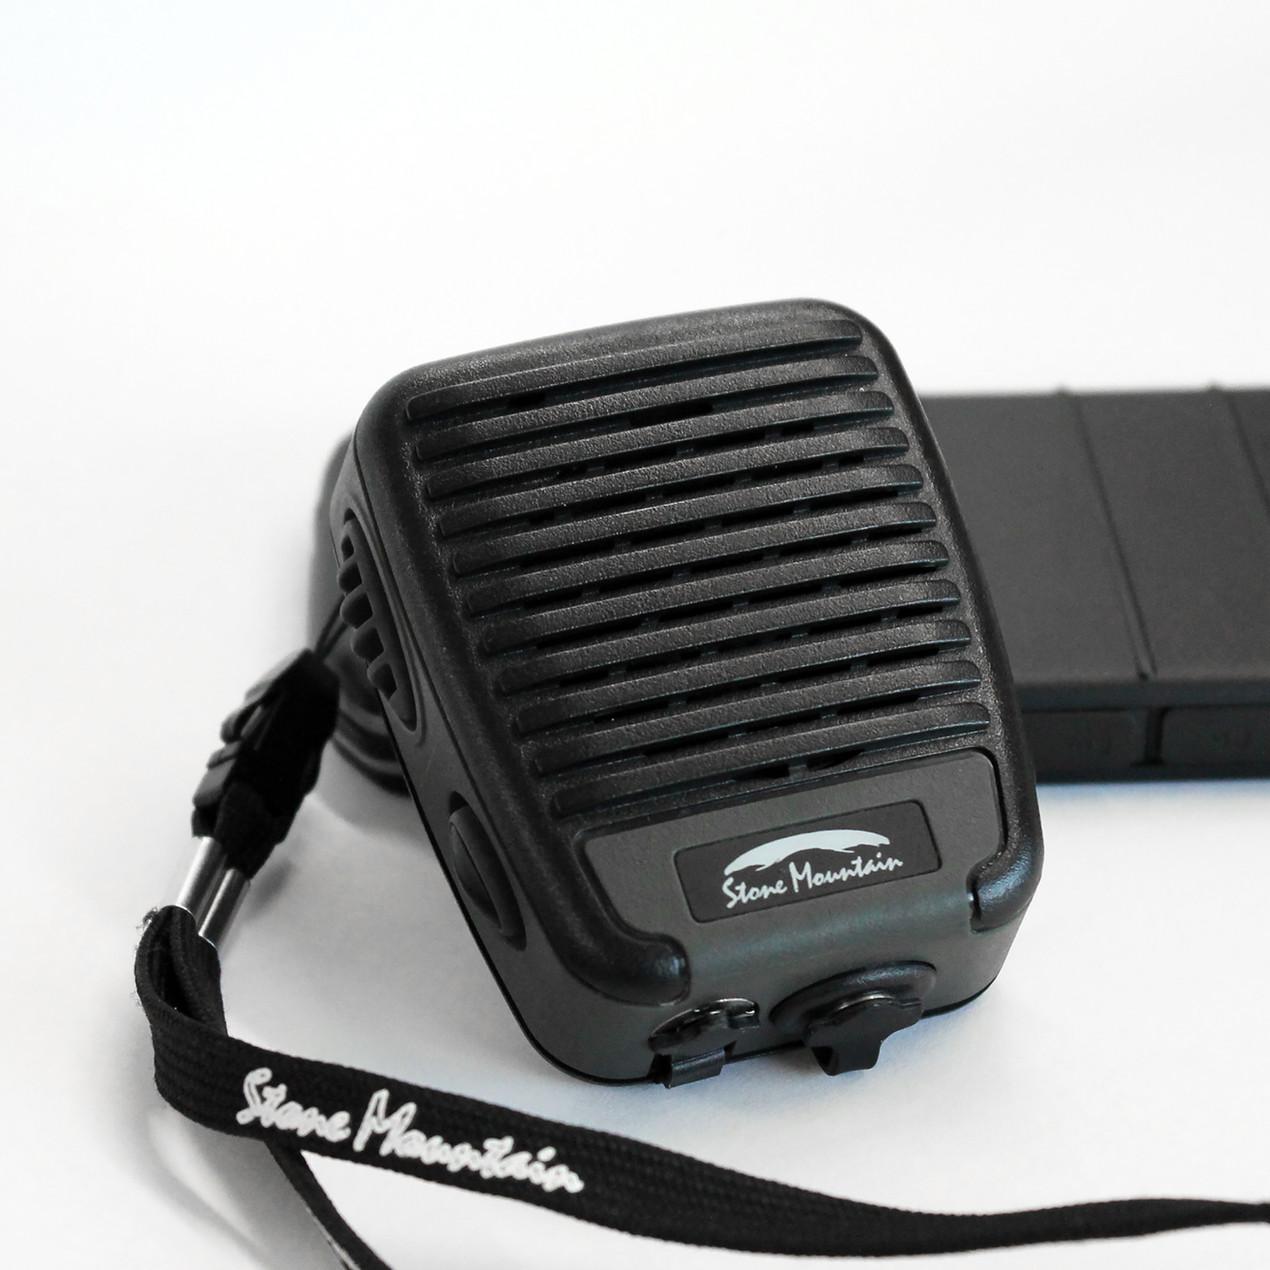 BluSkye Bluetooth RSM PoC wired speaker mic blackline simulations tactical zello accessories for airsoft milsim IP68 MIL-STD-810G stone mountain